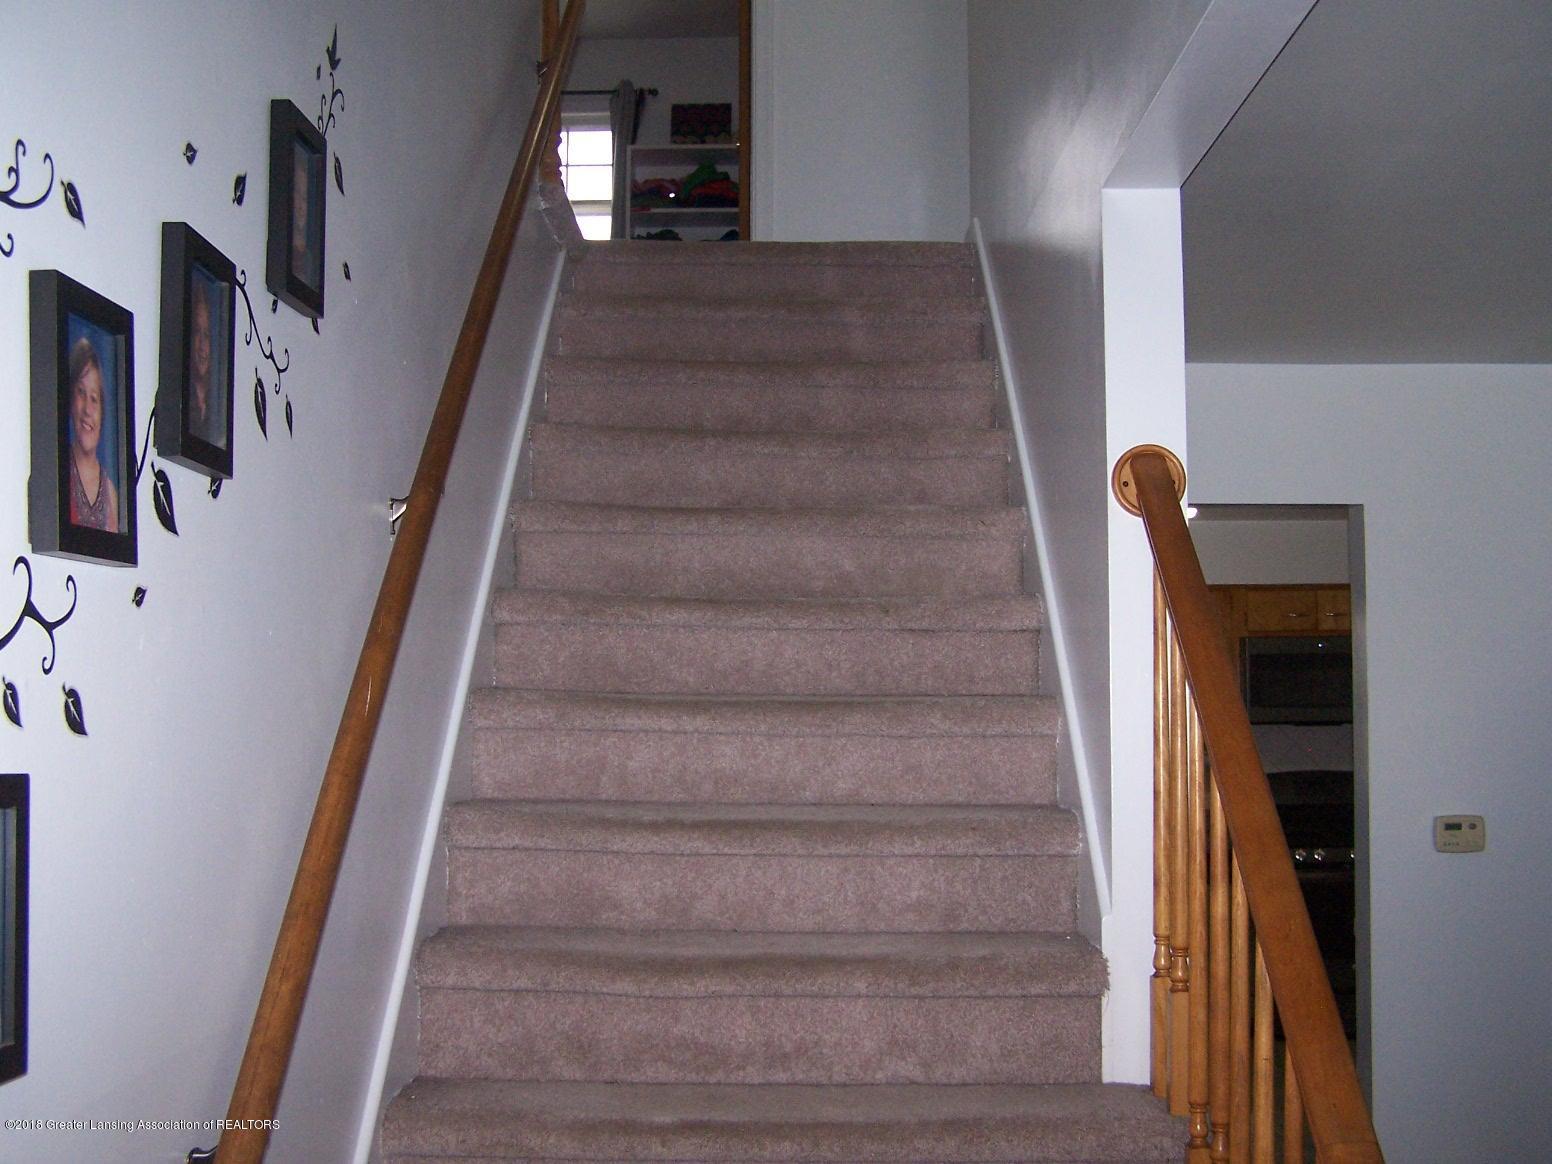 805 Raeburn Rd - stairs2 - 49